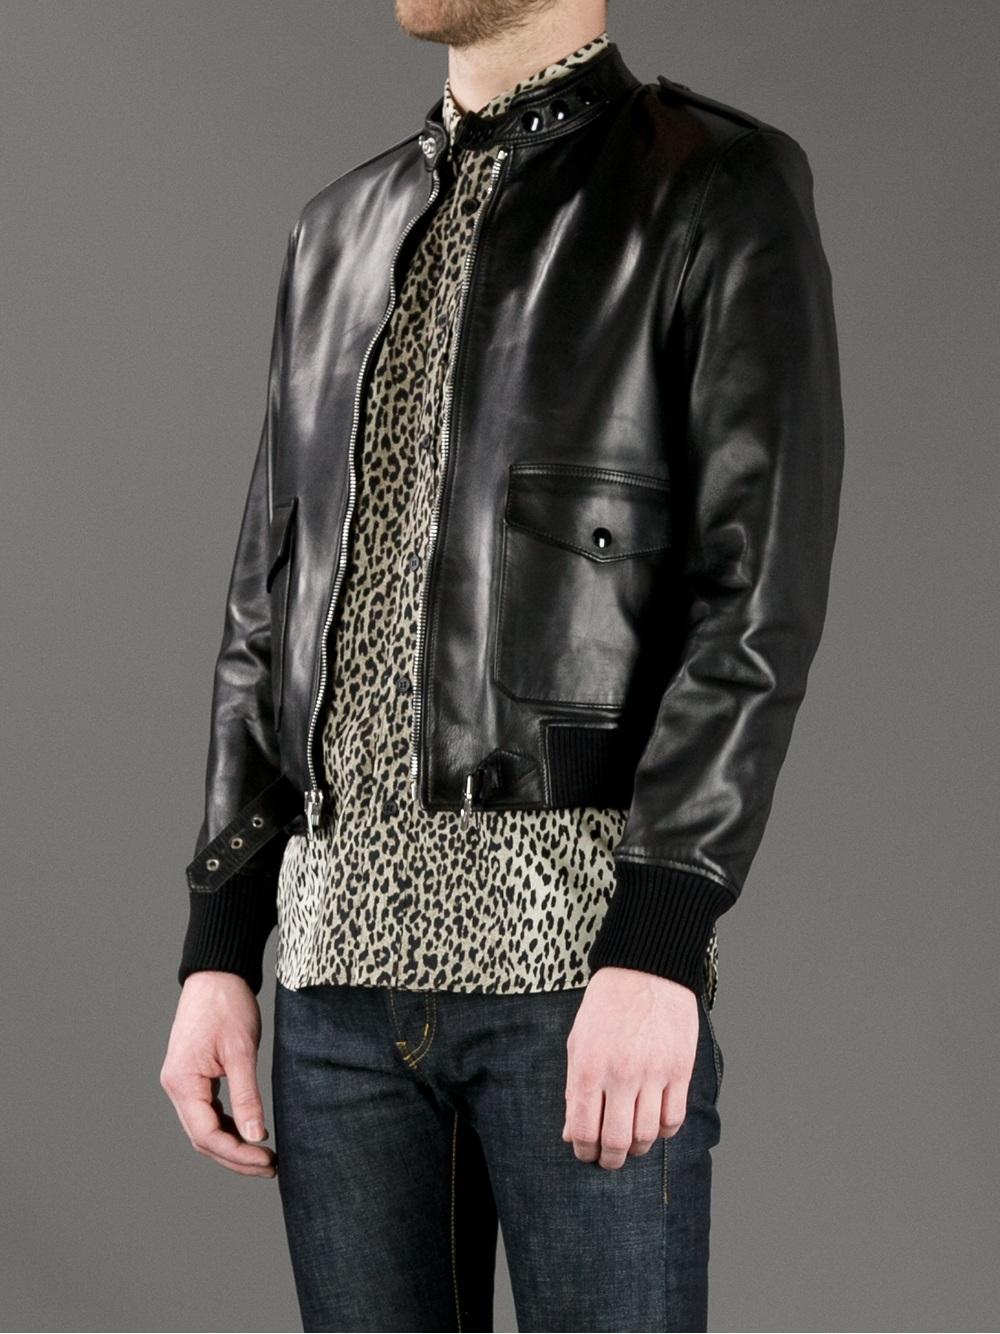 e0f4b69d2 Saint Laurent Contrast Leather Bomber Jacket in Black for Men - Lyst